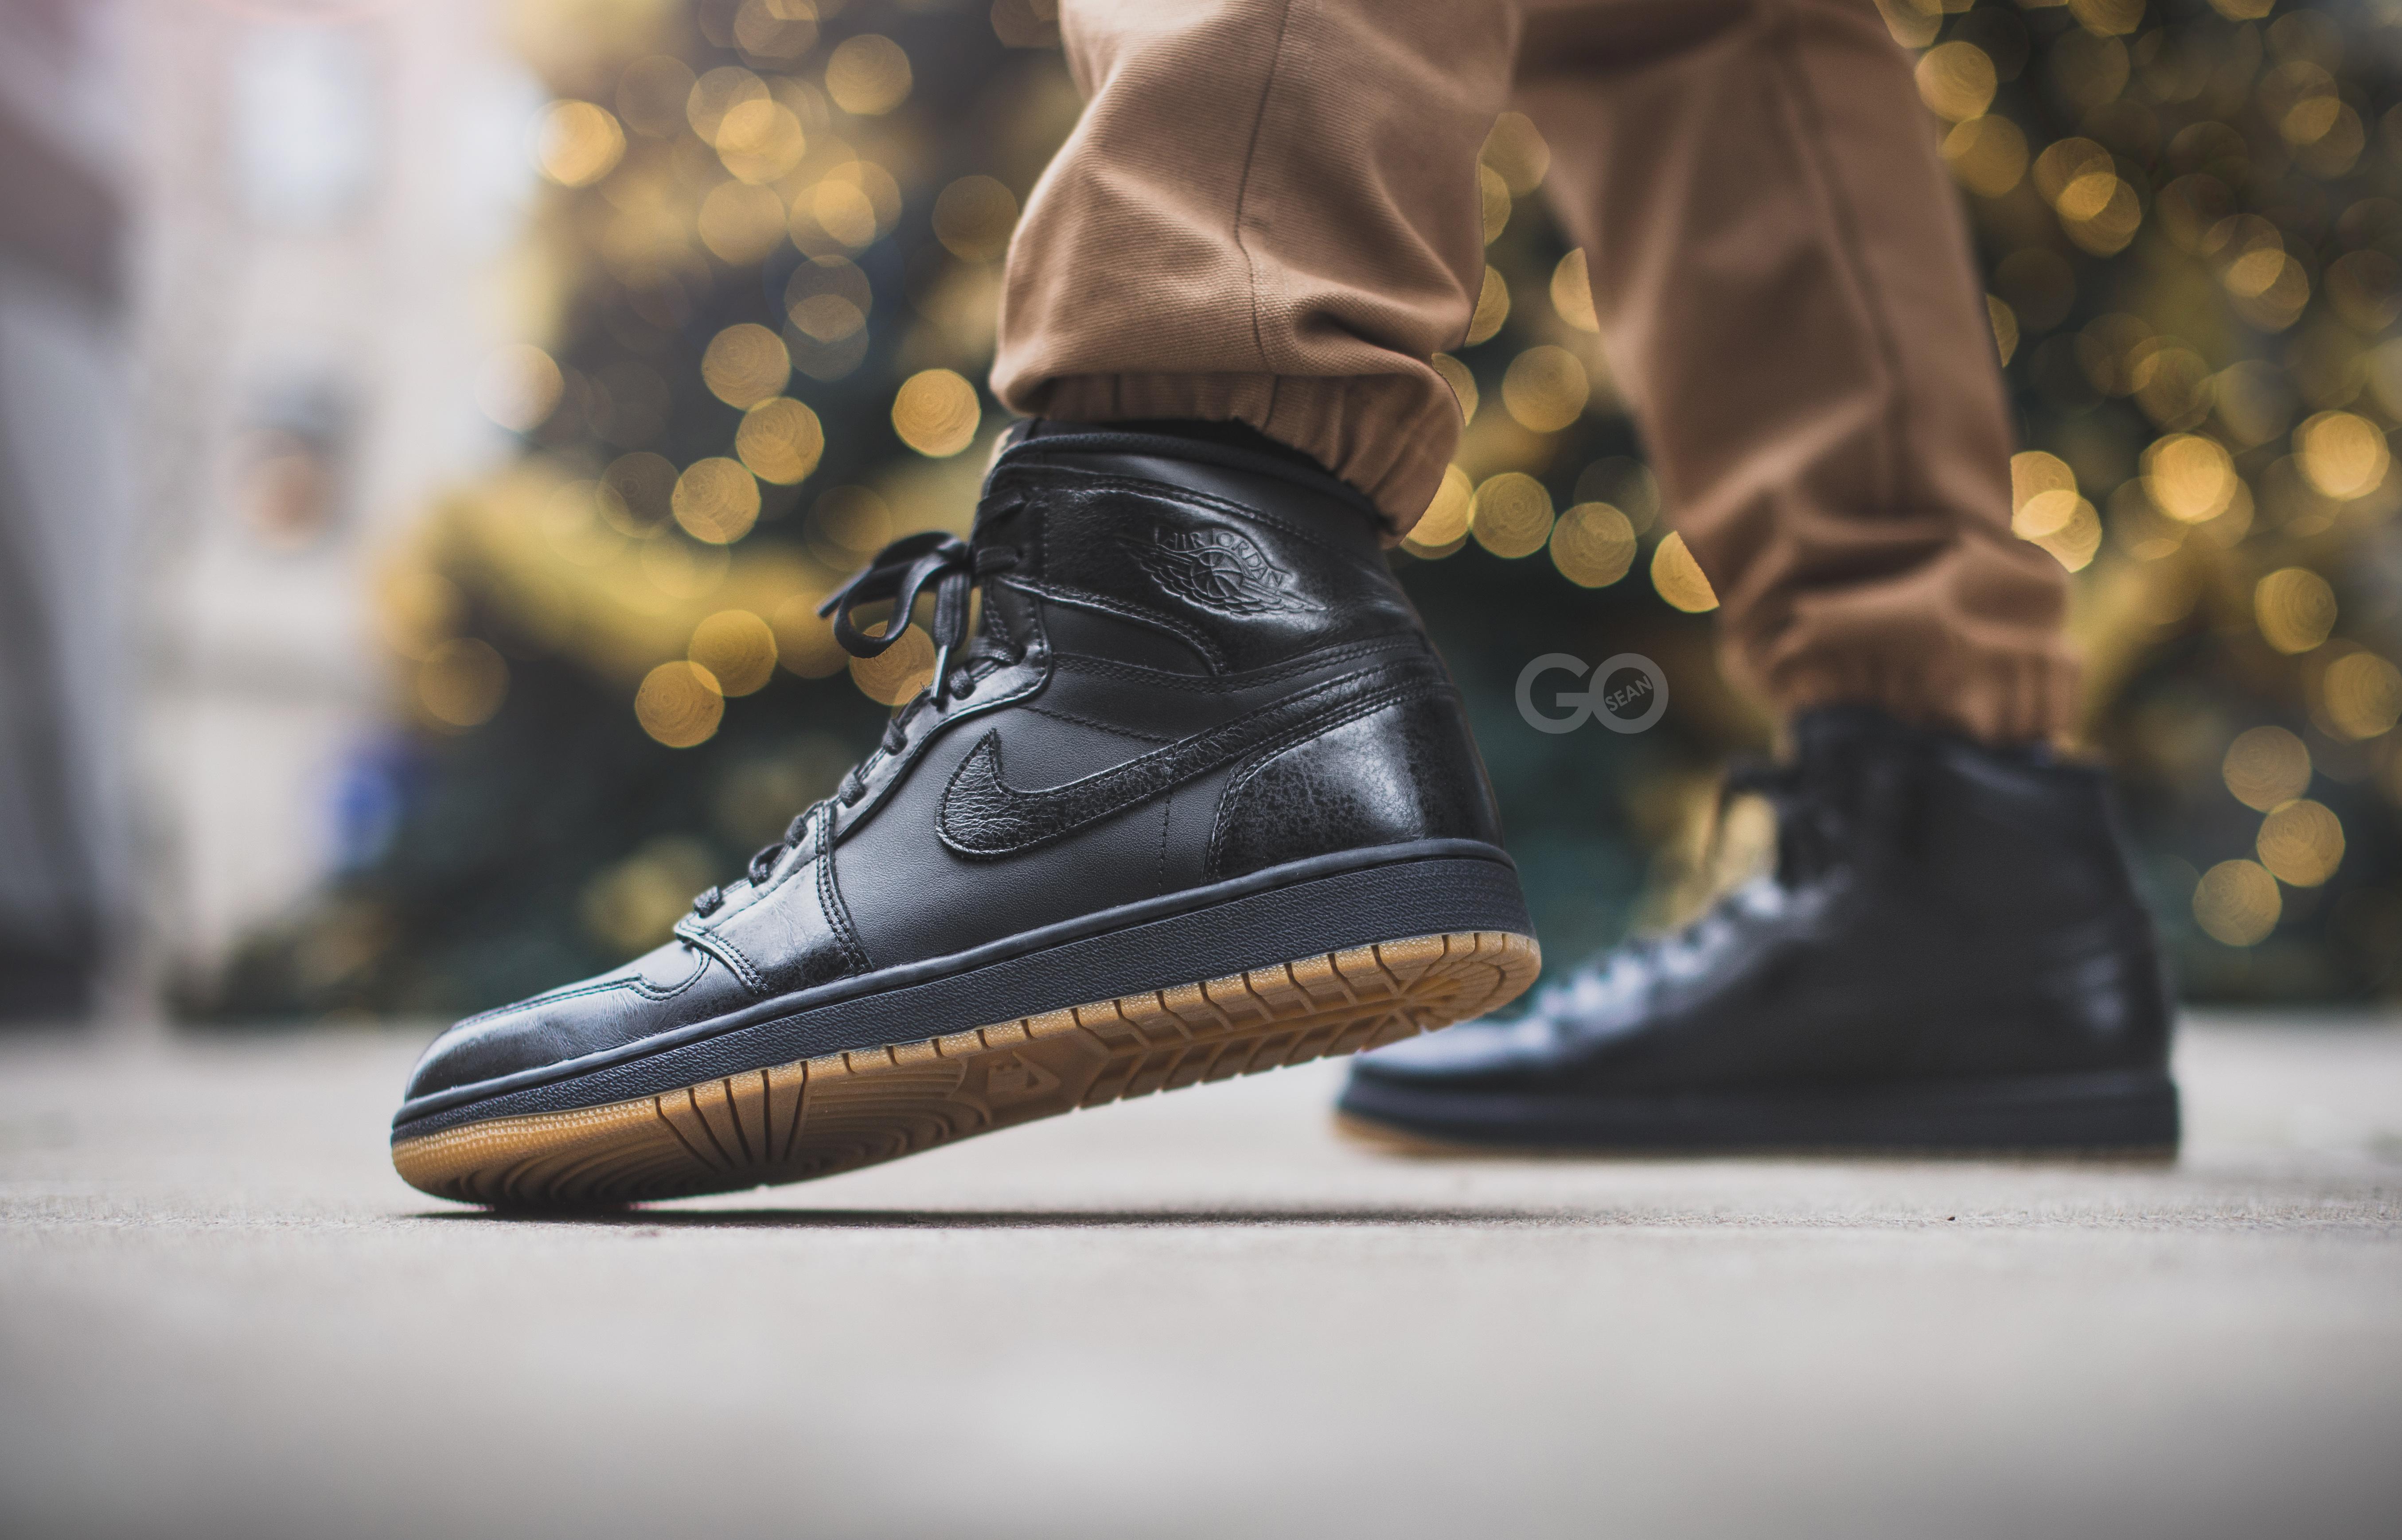 Black Wallpaper Photography Iss Sneakers Nike Nikon Shoes qw5O4UwH